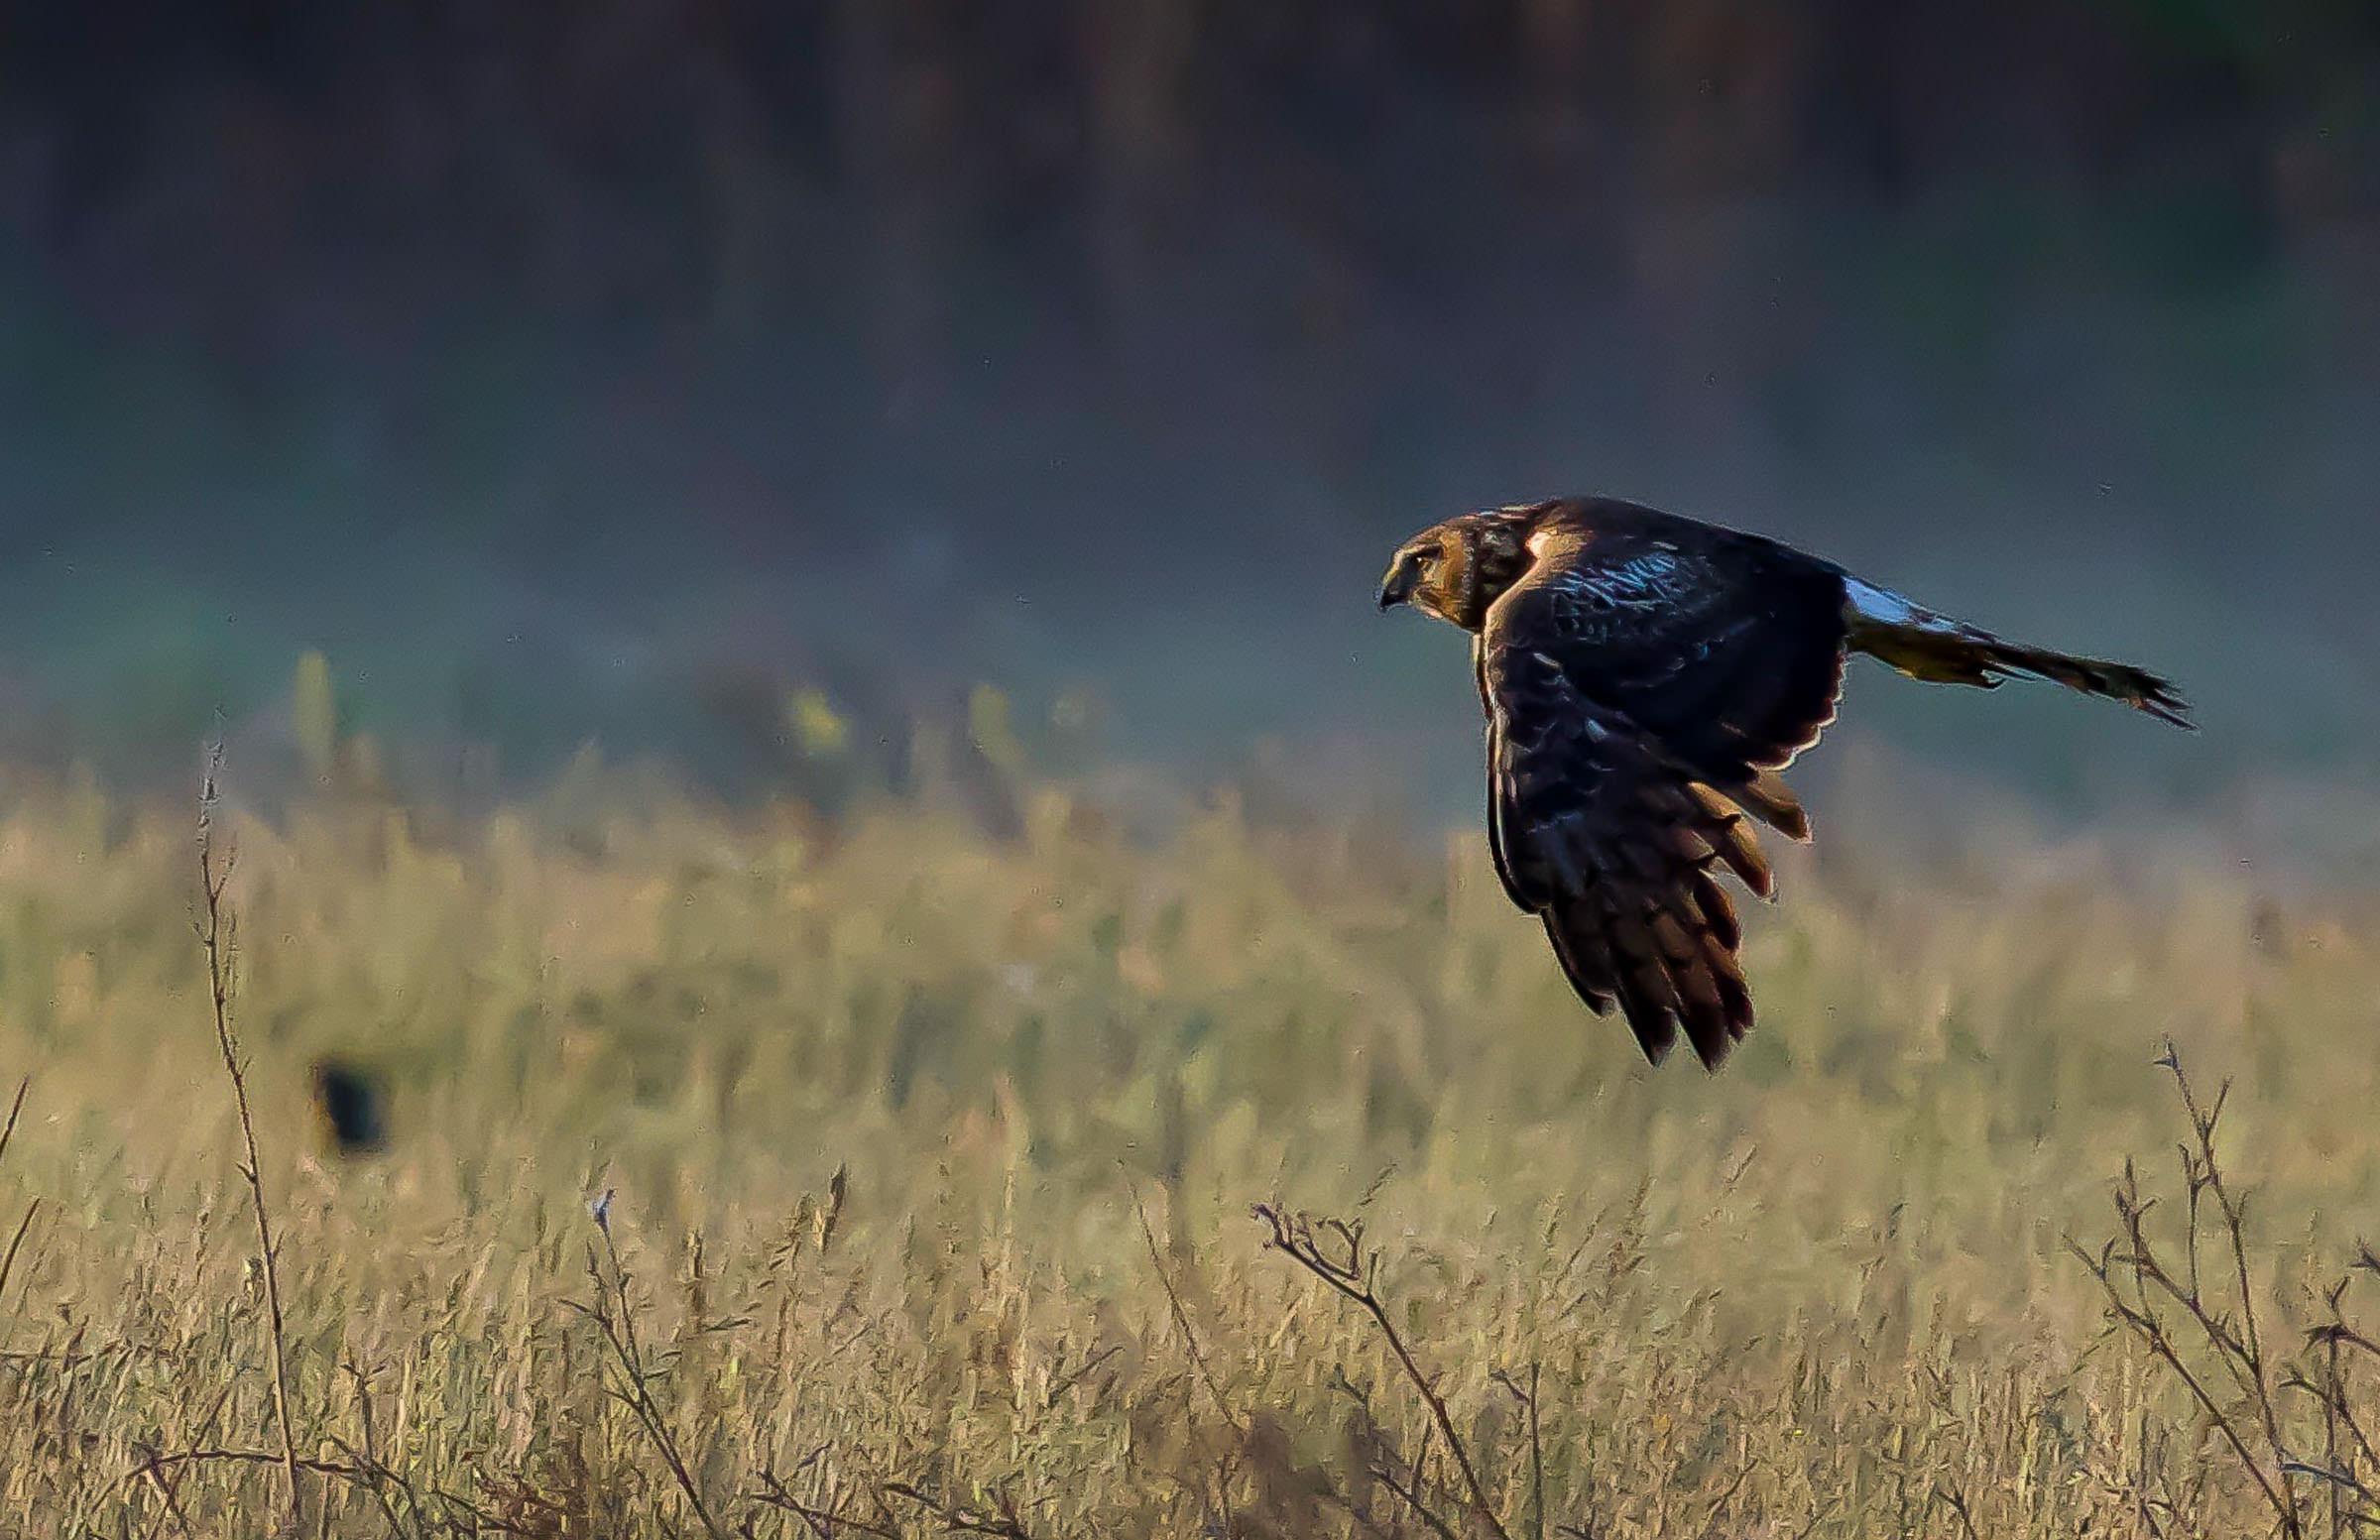 northern_harrier_hunting_jackrabbit-7.jpg